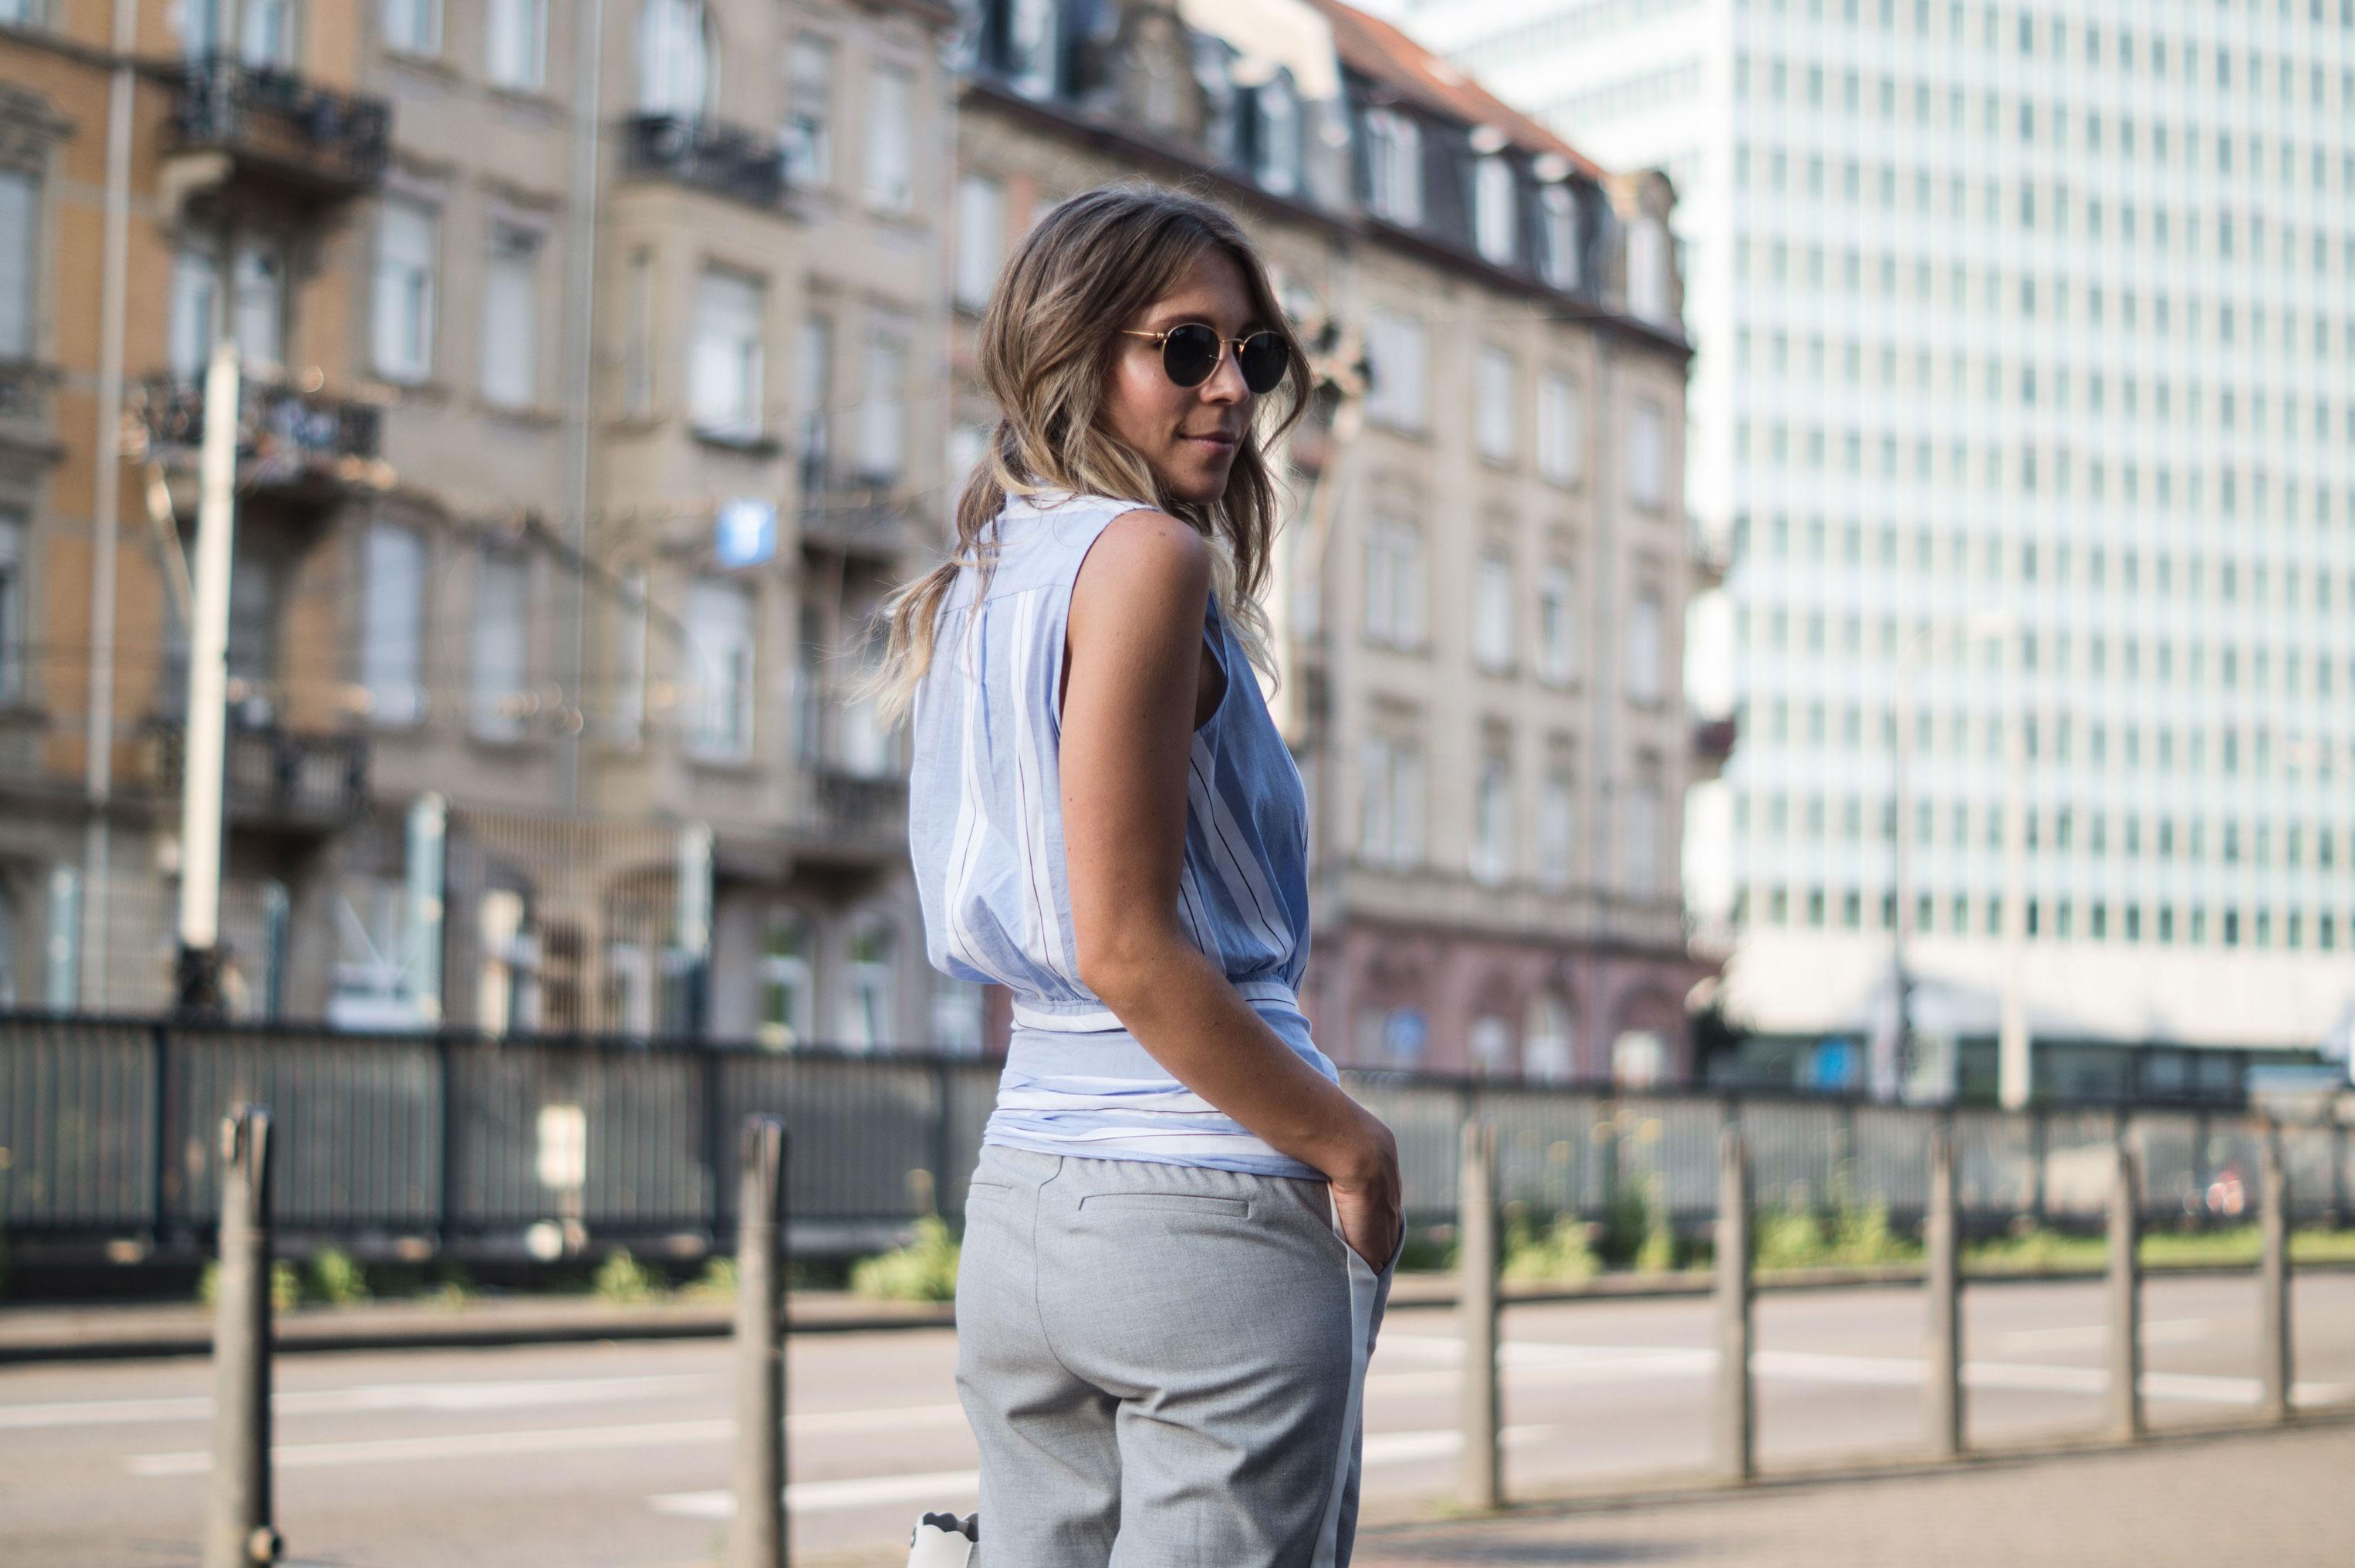 Mango-Wrap-Blouse-Knotenbluse-Joggers-Sariety-Fashionblogger-Modeblog-Heidelberg-Streetstyle-3